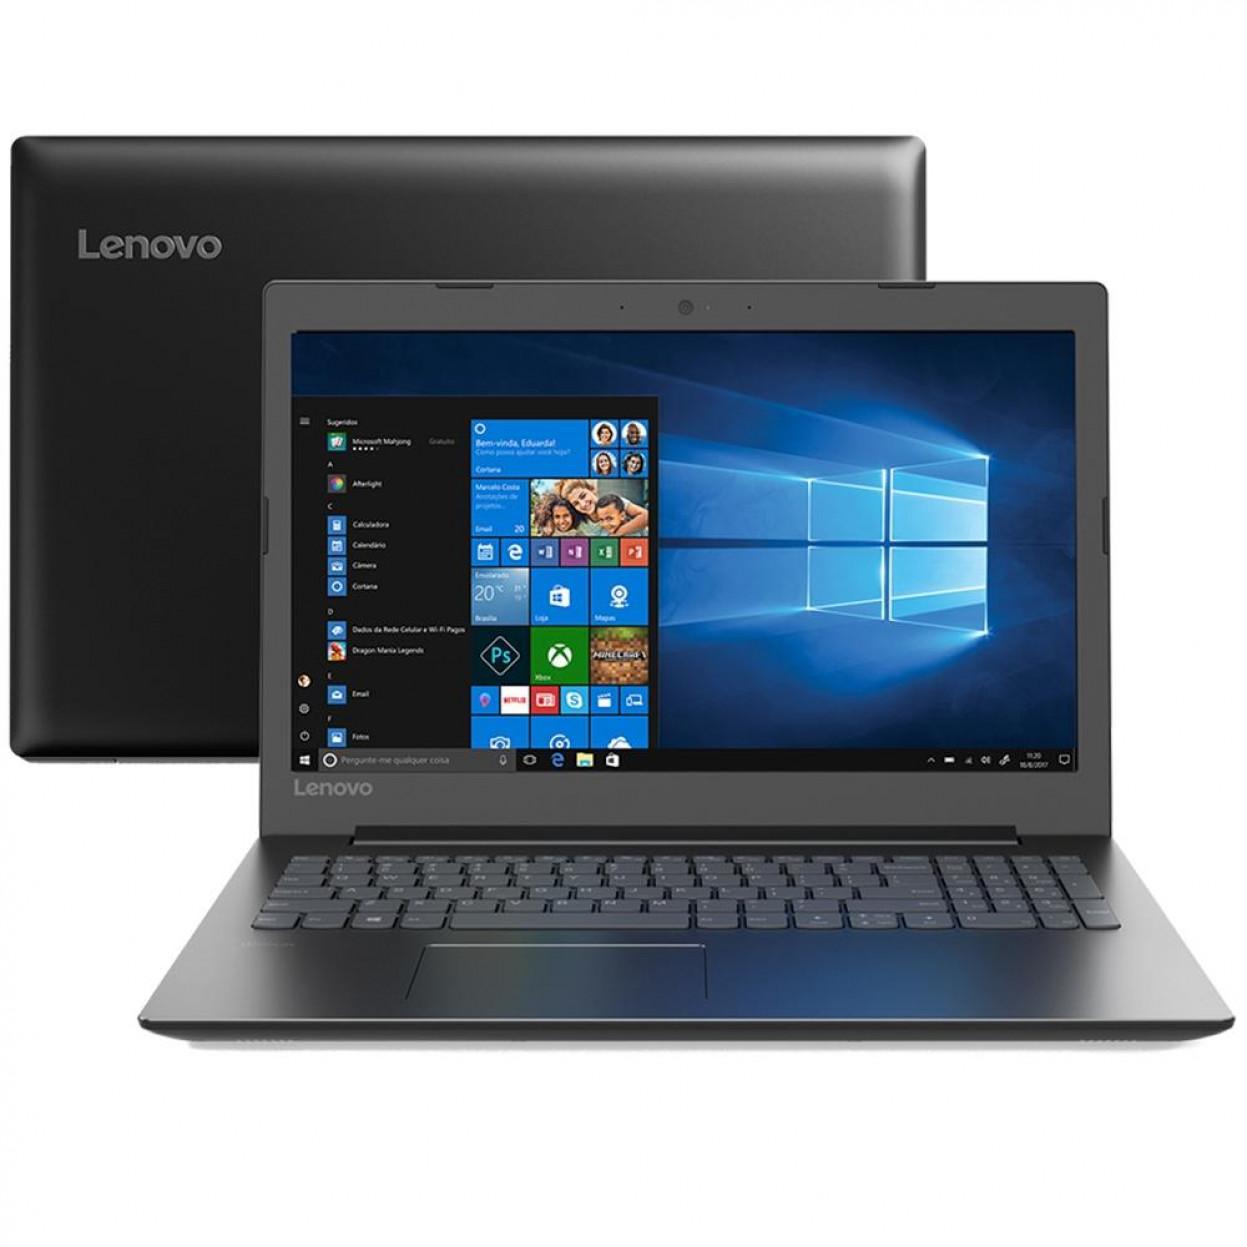 Notebook Lenovo B330 Core I3 7020u Memoria 12gb Ssd 120gb Tela 15.6' Hd Windows 10 Home